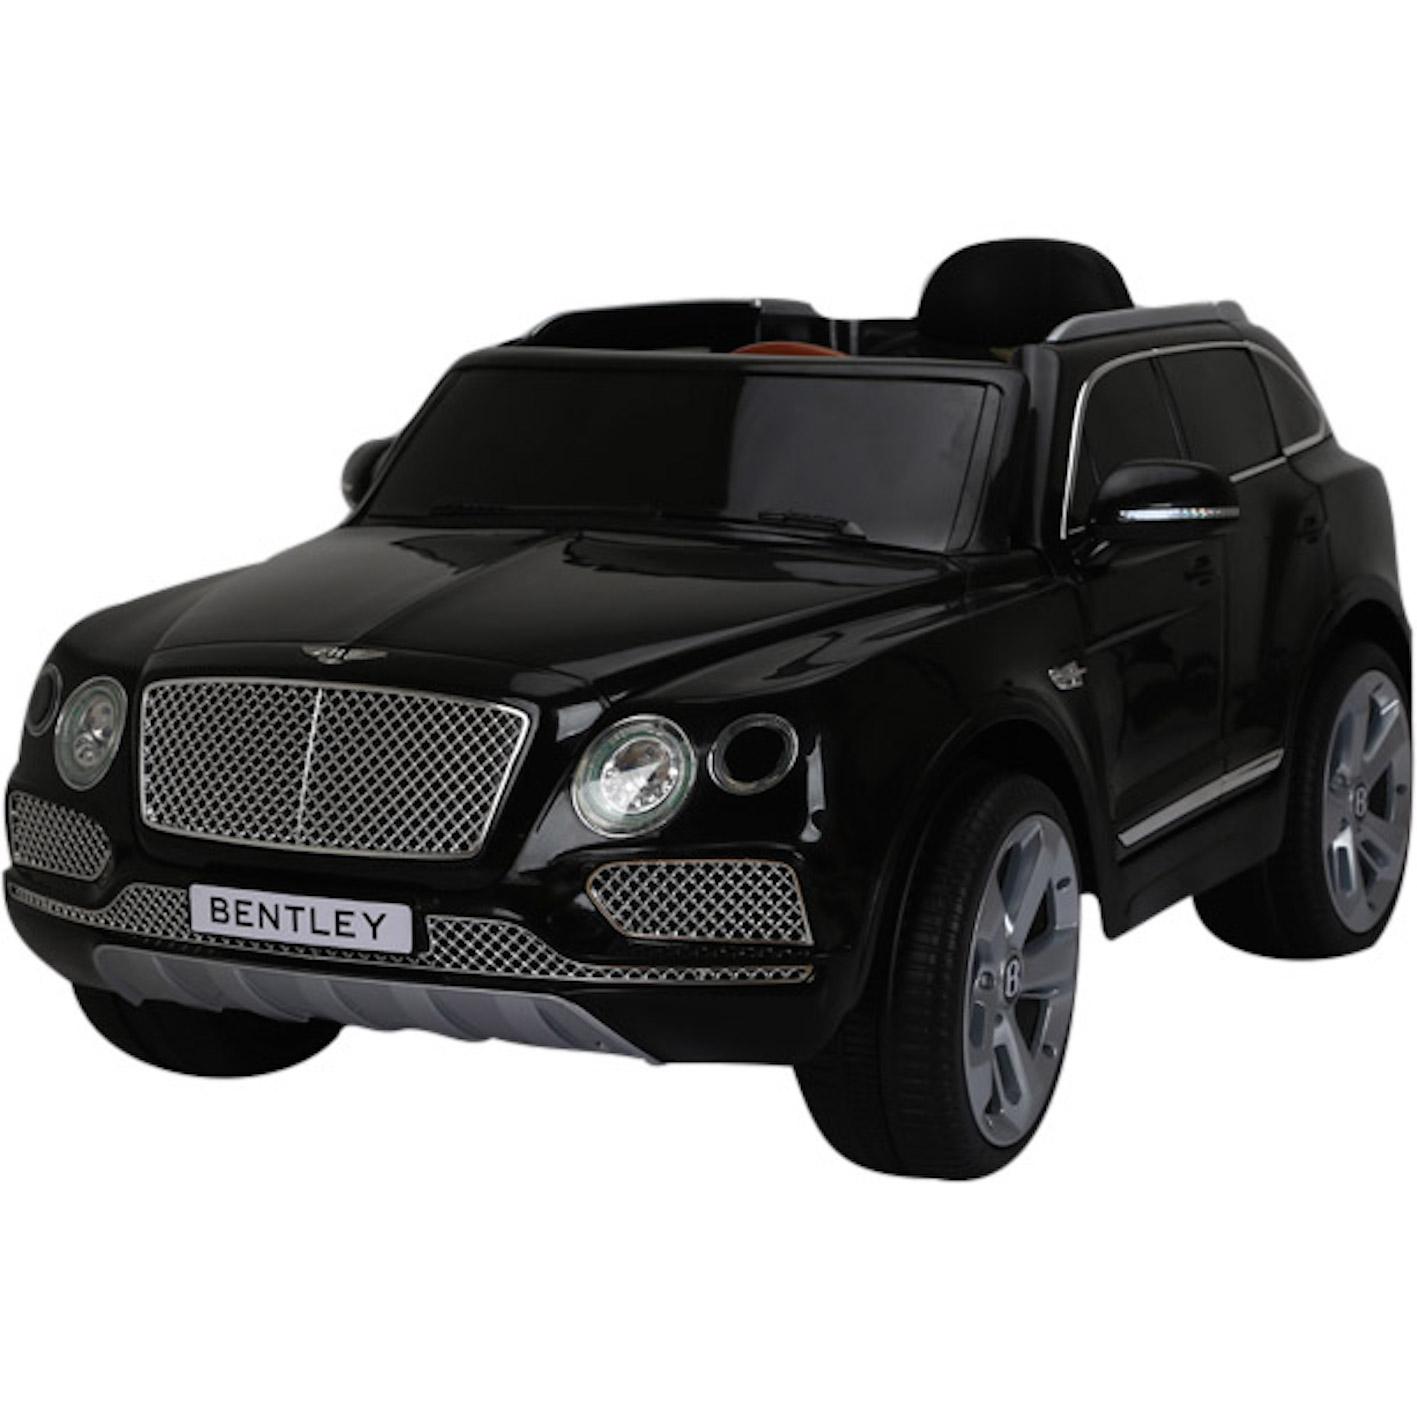 Best Ride On Cars Bentley Ra 12v: Licensed Bentley Bentayga 12V Children's Electric Ride On